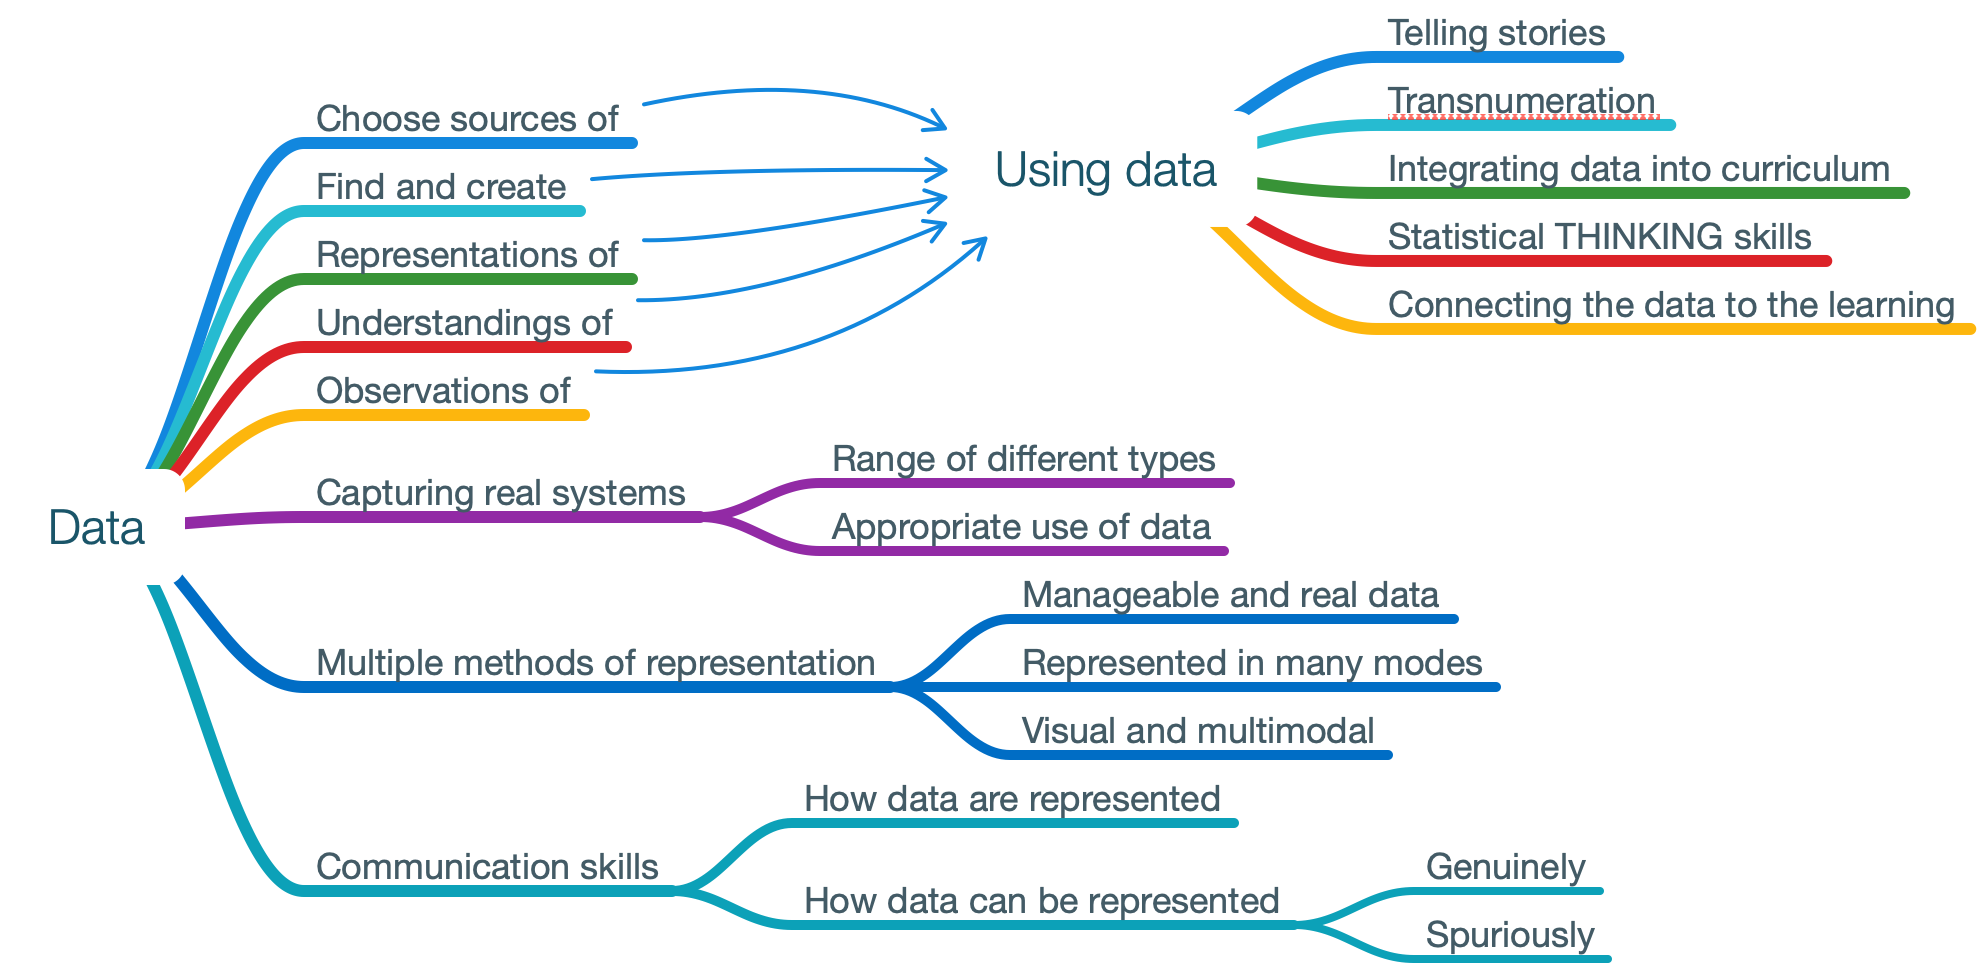 Using Data Image